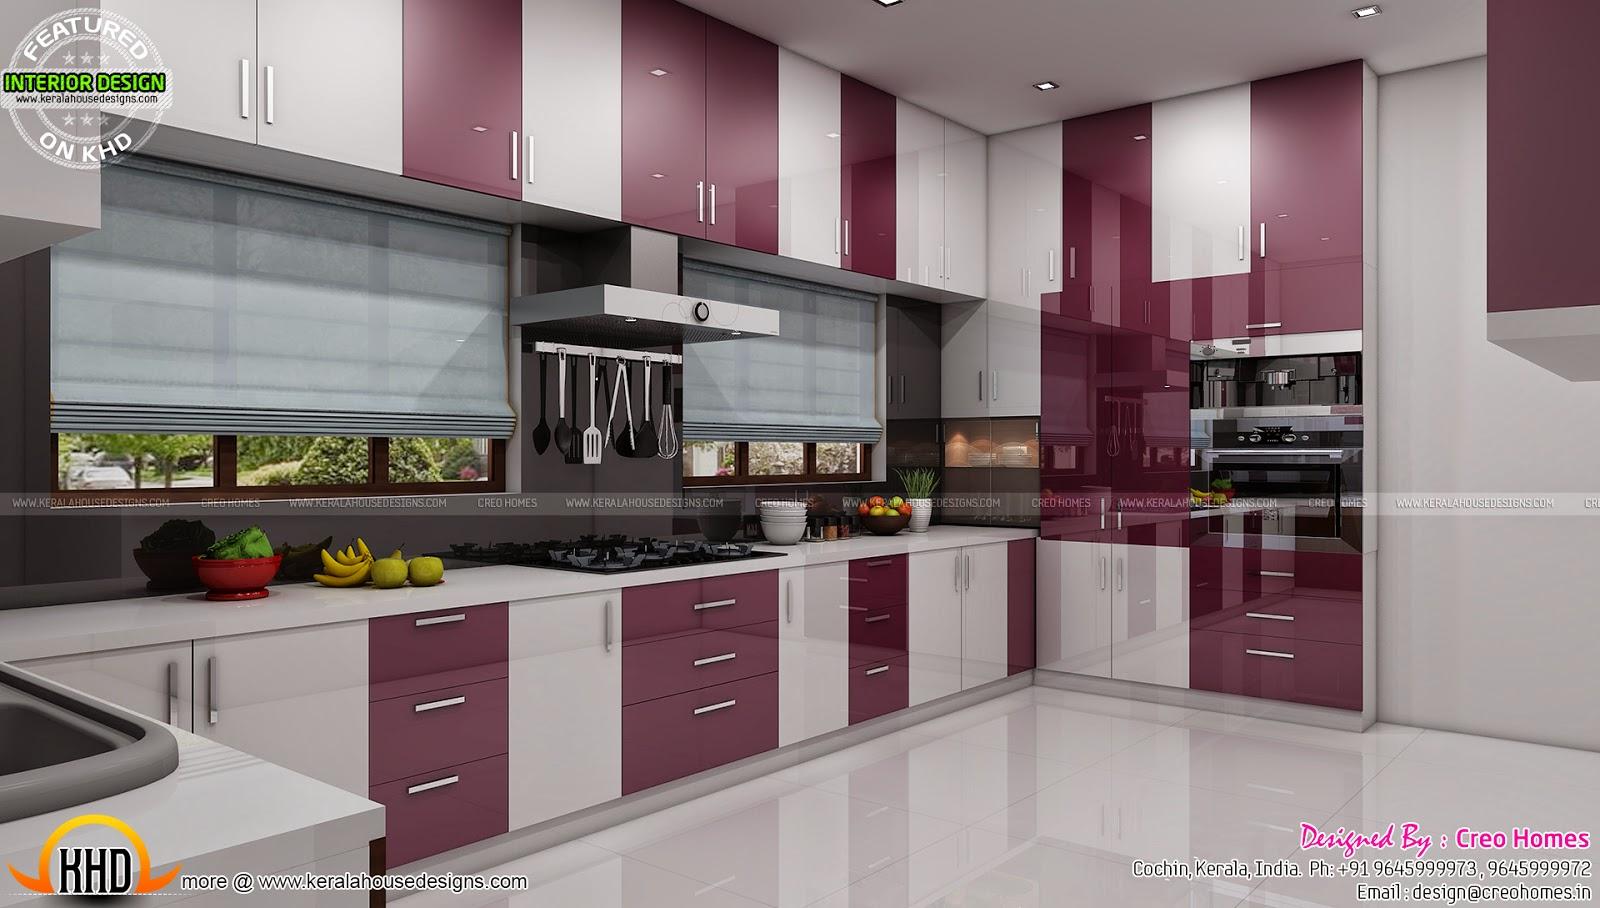 Living Prayer Kitchen Interiors Kerala Home Design And Floor Plans